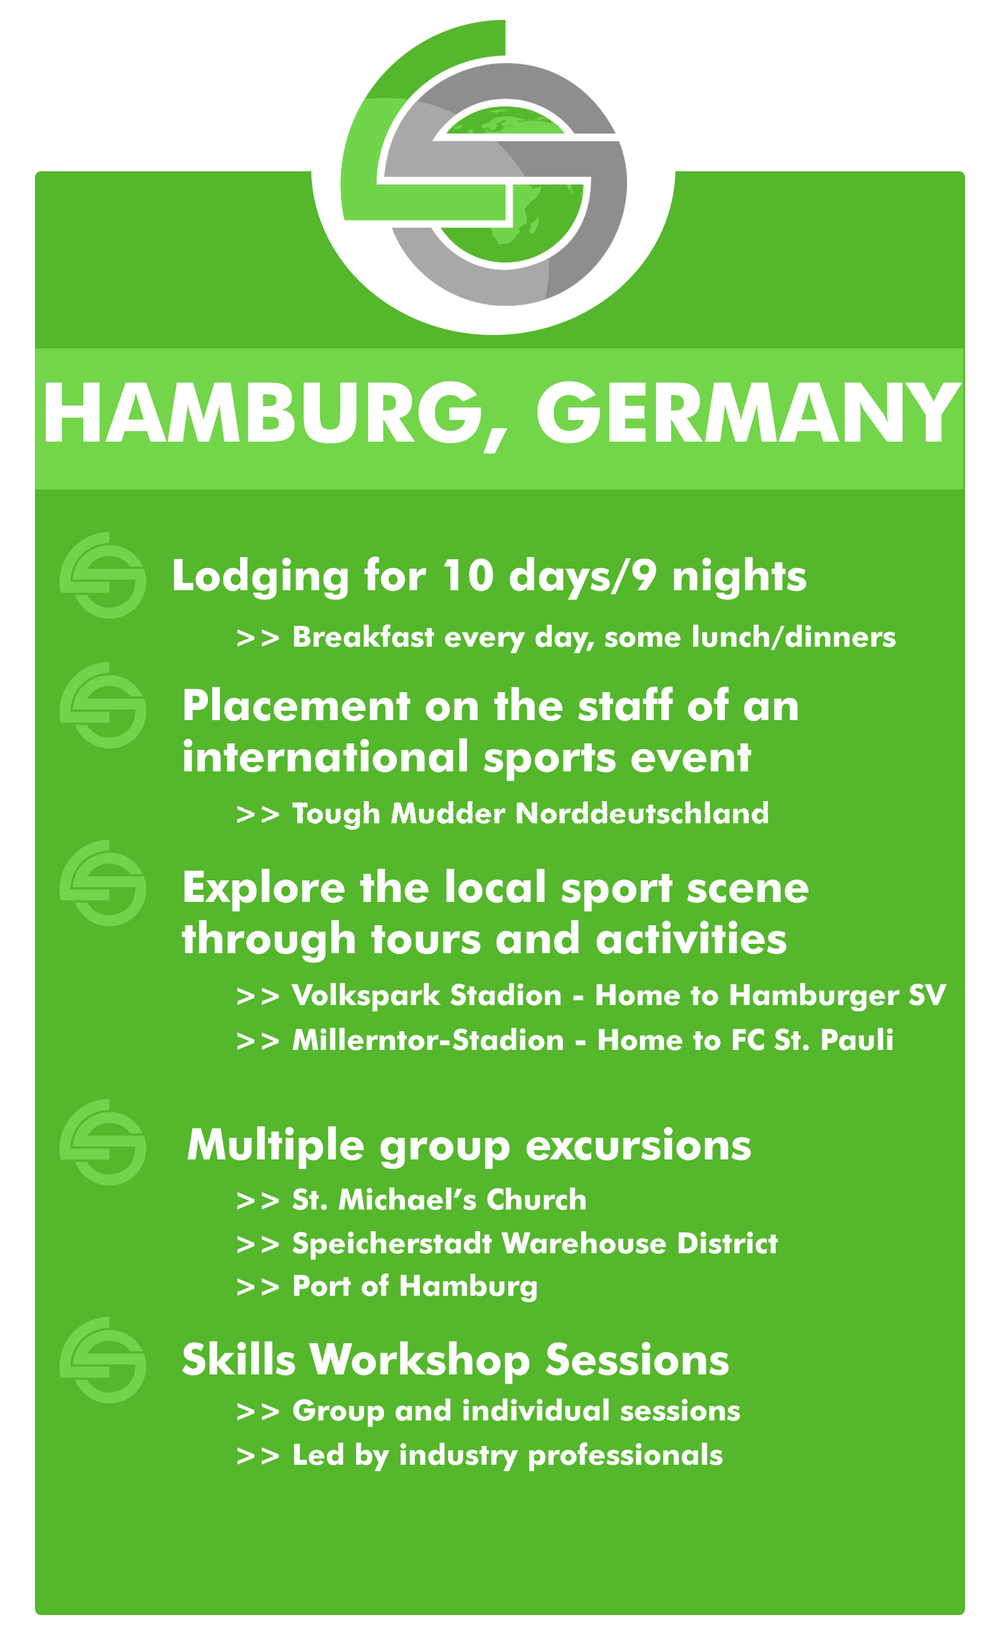 HAMBURG GERMANY ICON.png